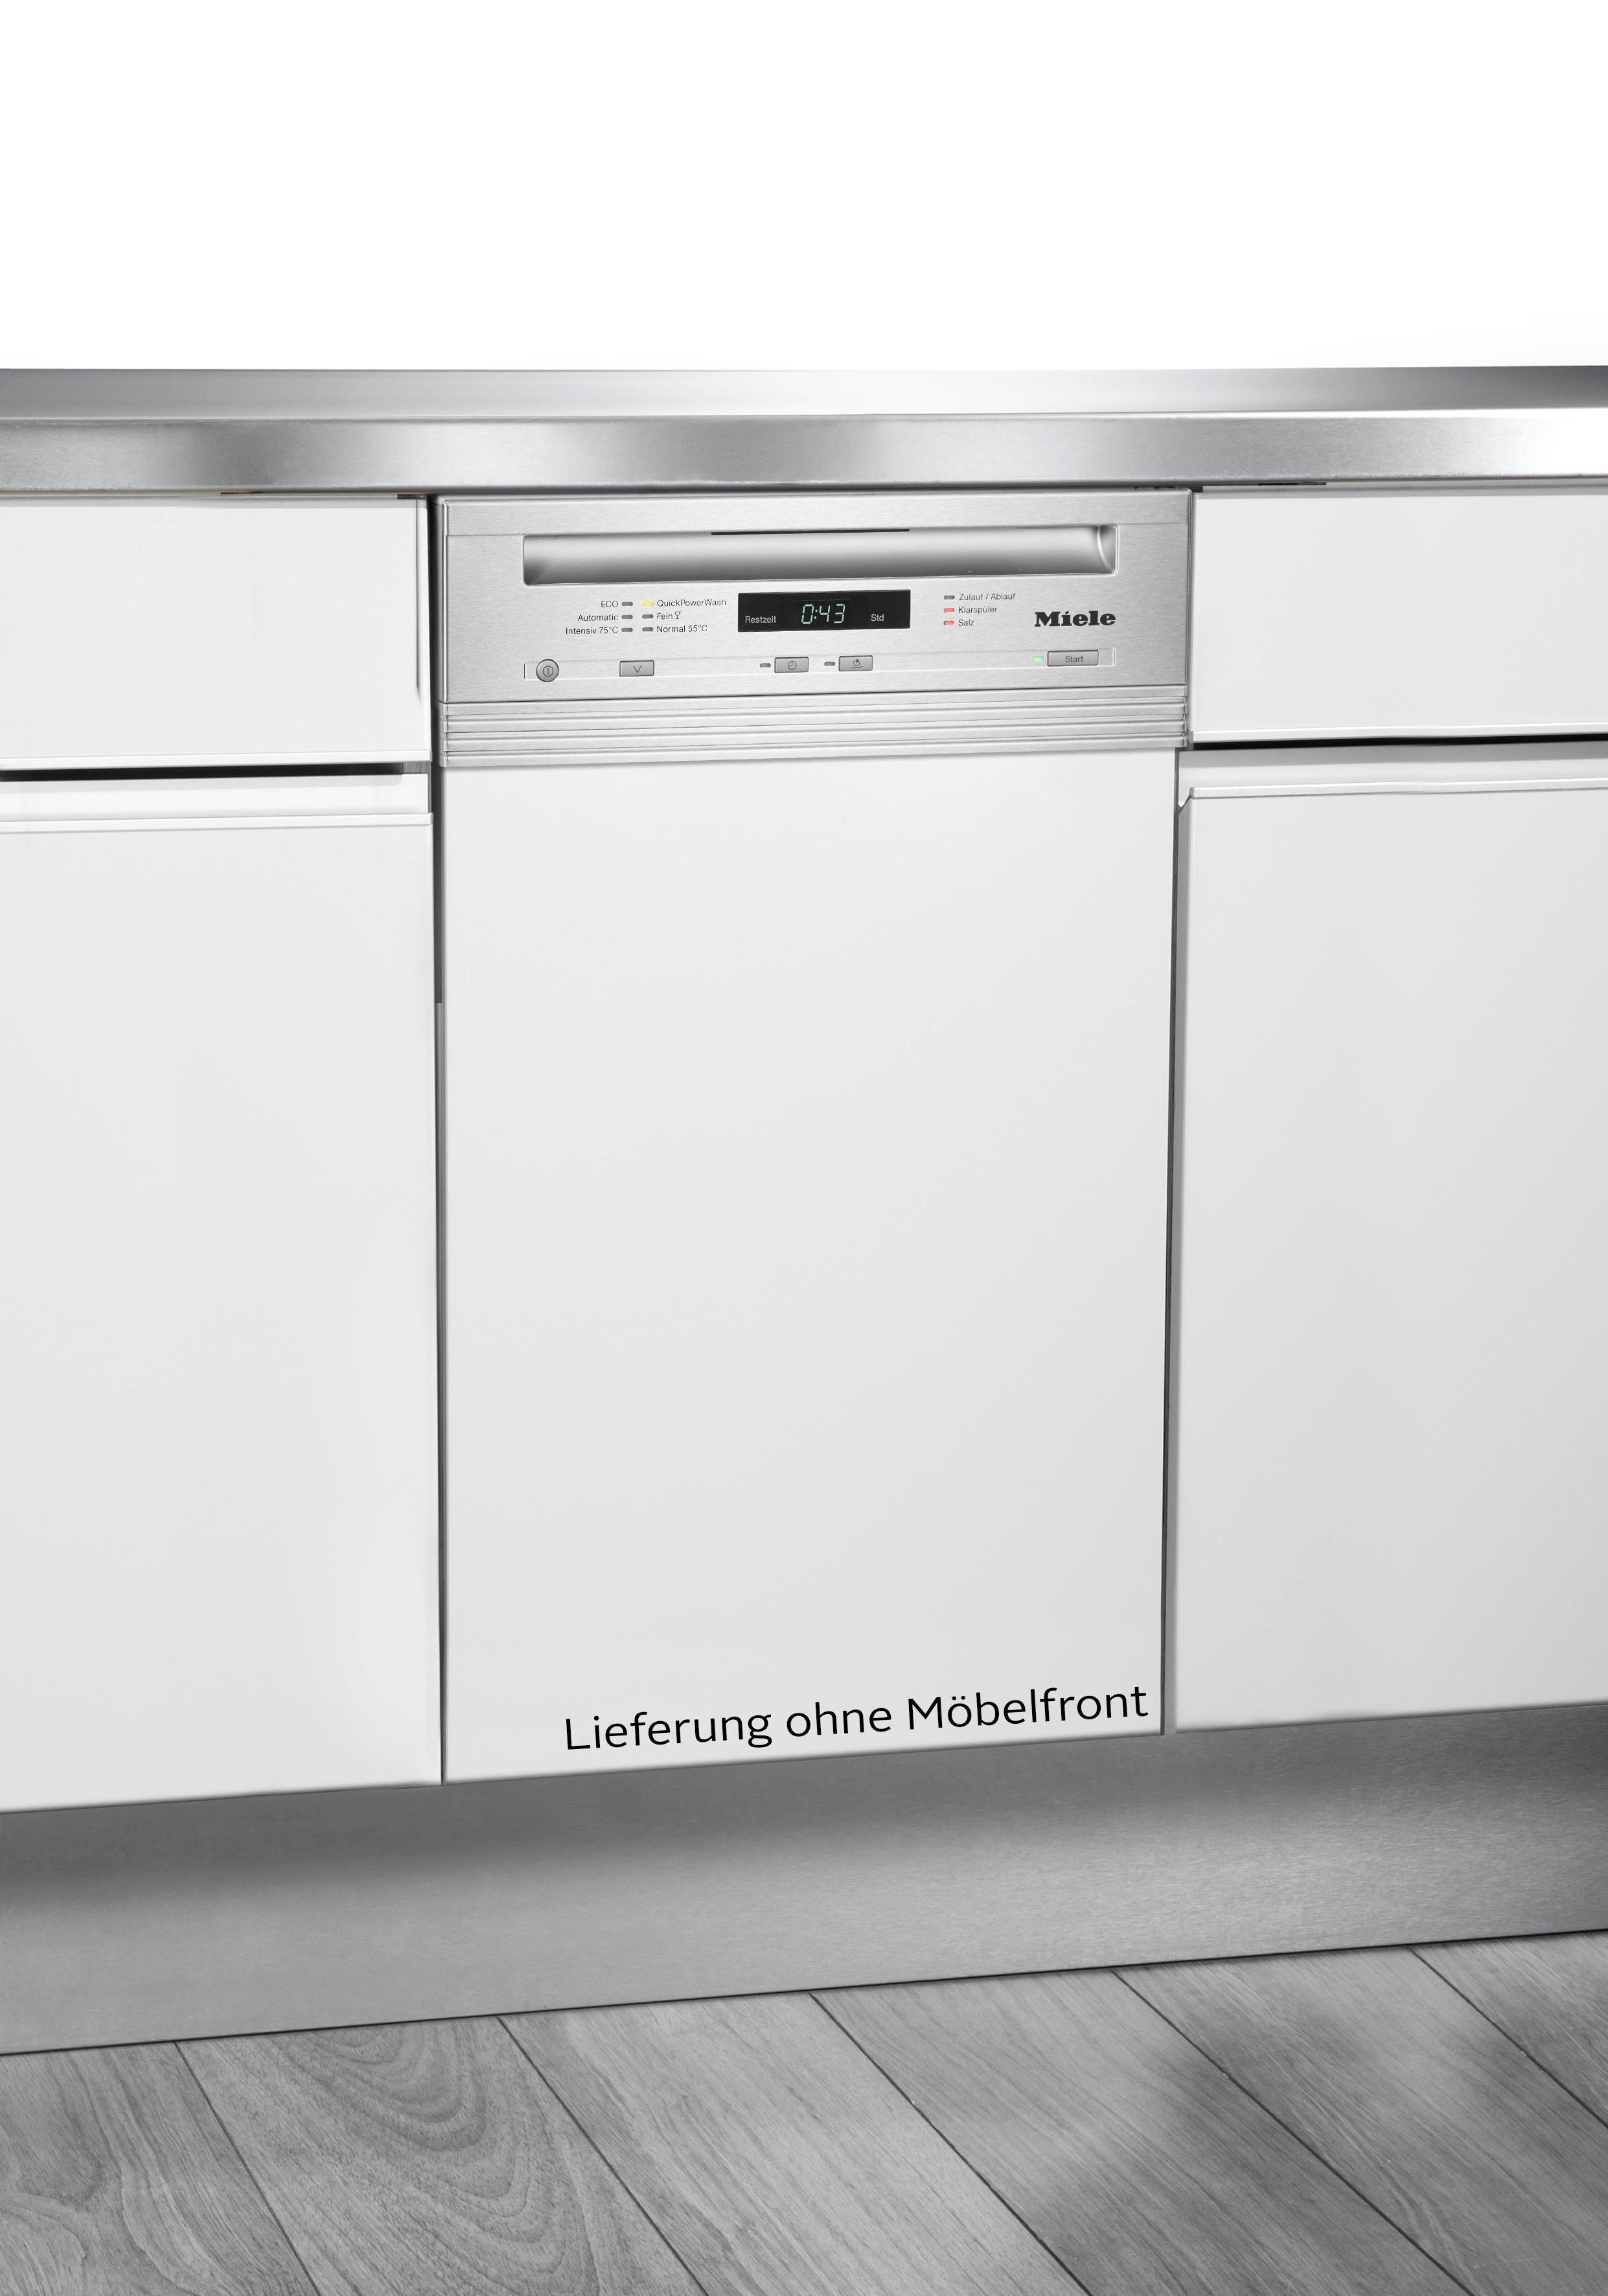 Miele teilintegrierbarer Geschirrspüler, G 4722 SCi ed/clst, 0,87 l, 9 Maßgedecke, 45 cm breit